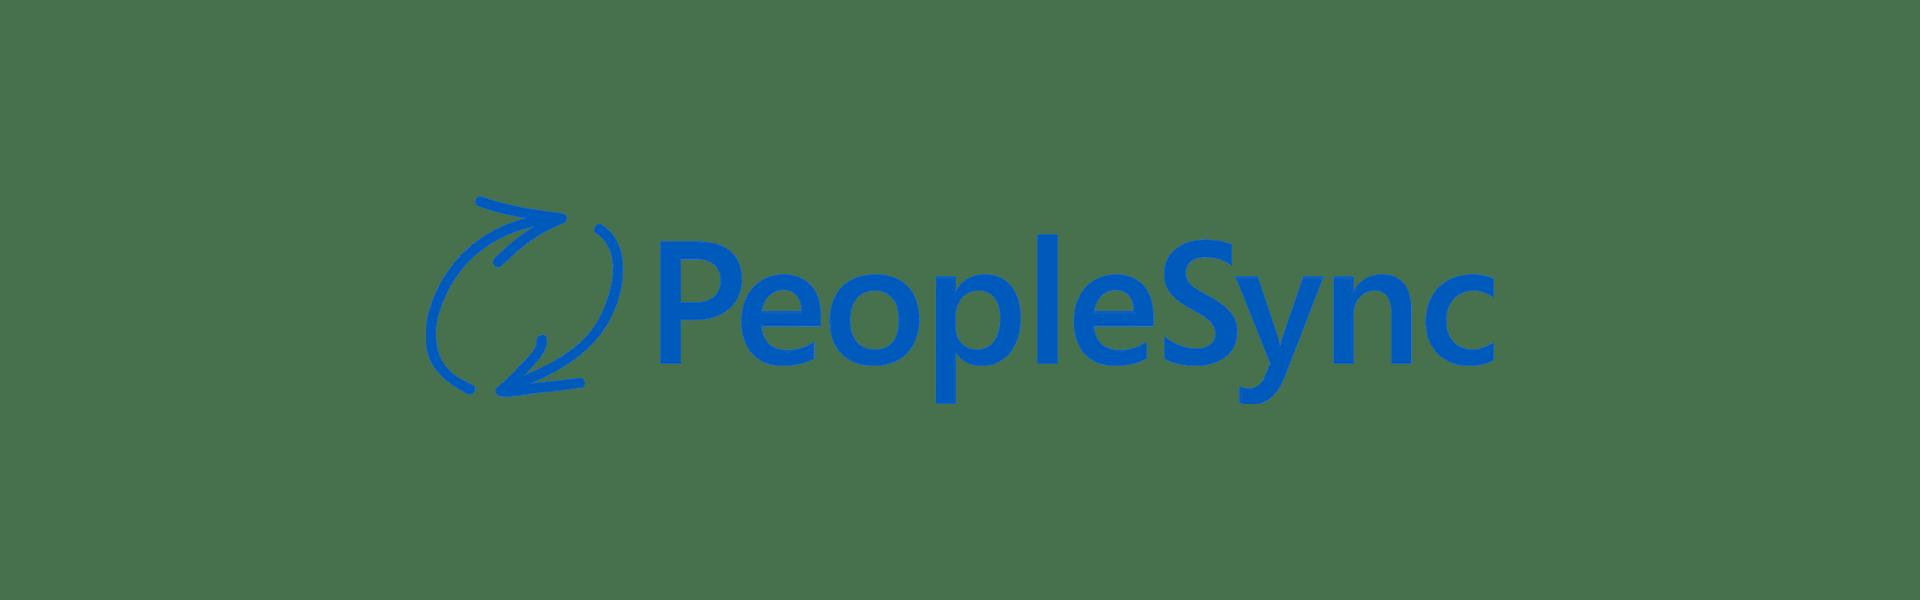 messageconcept peoplesync logo blue large